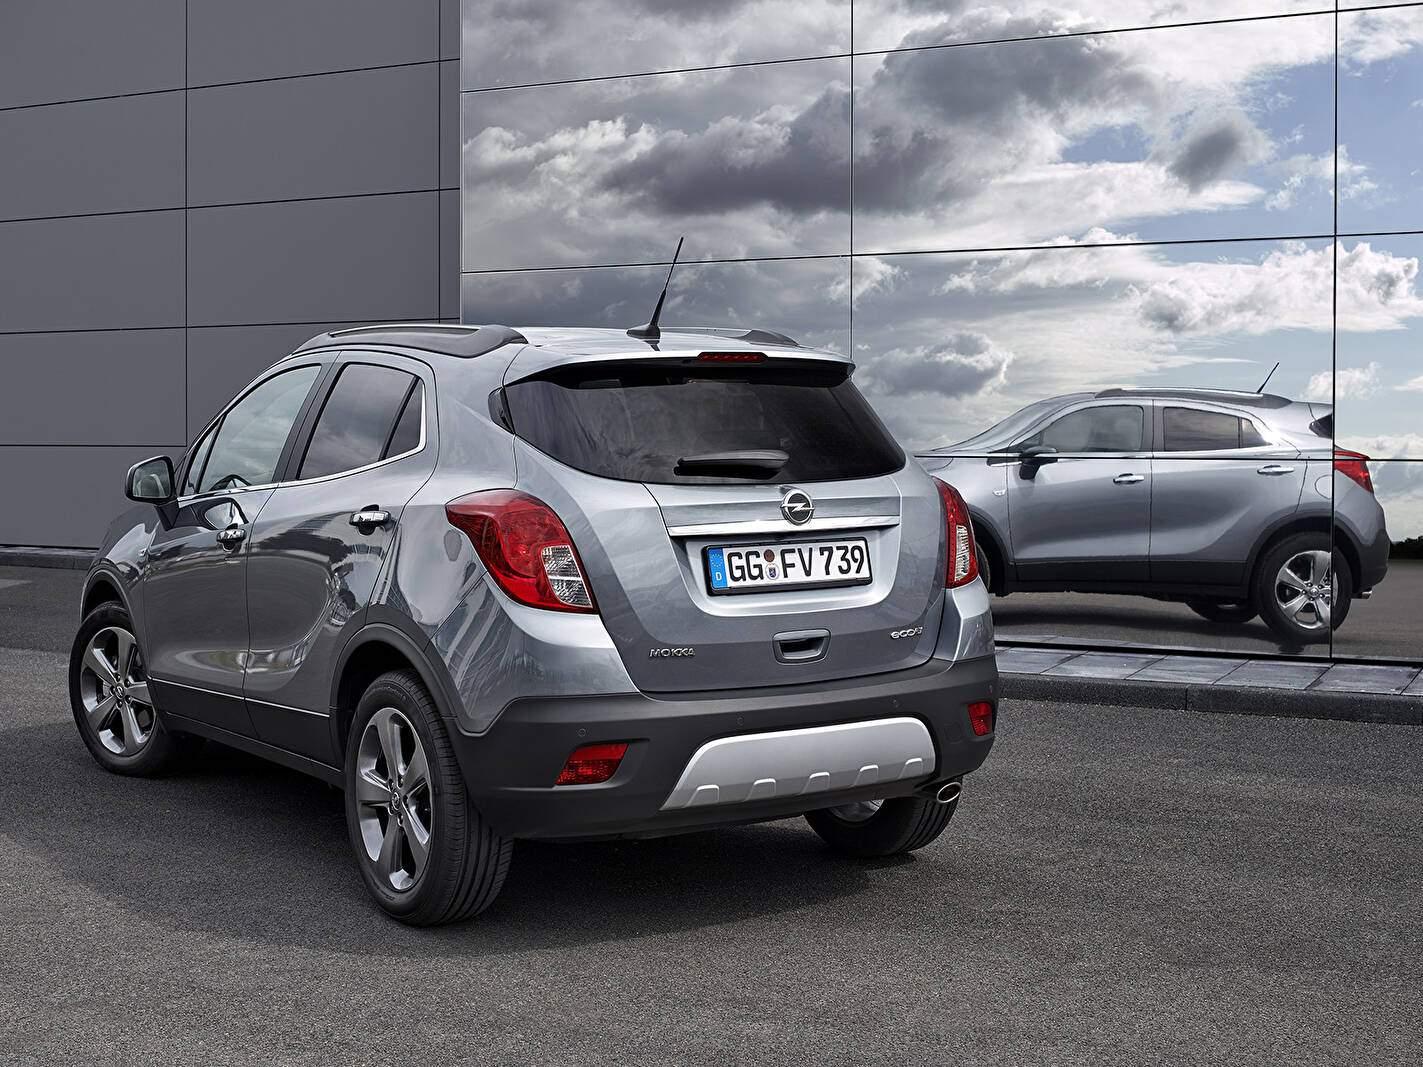 Opel Mokka 1.6 CDTi 110 (2015-2019),  ajouté par fox58